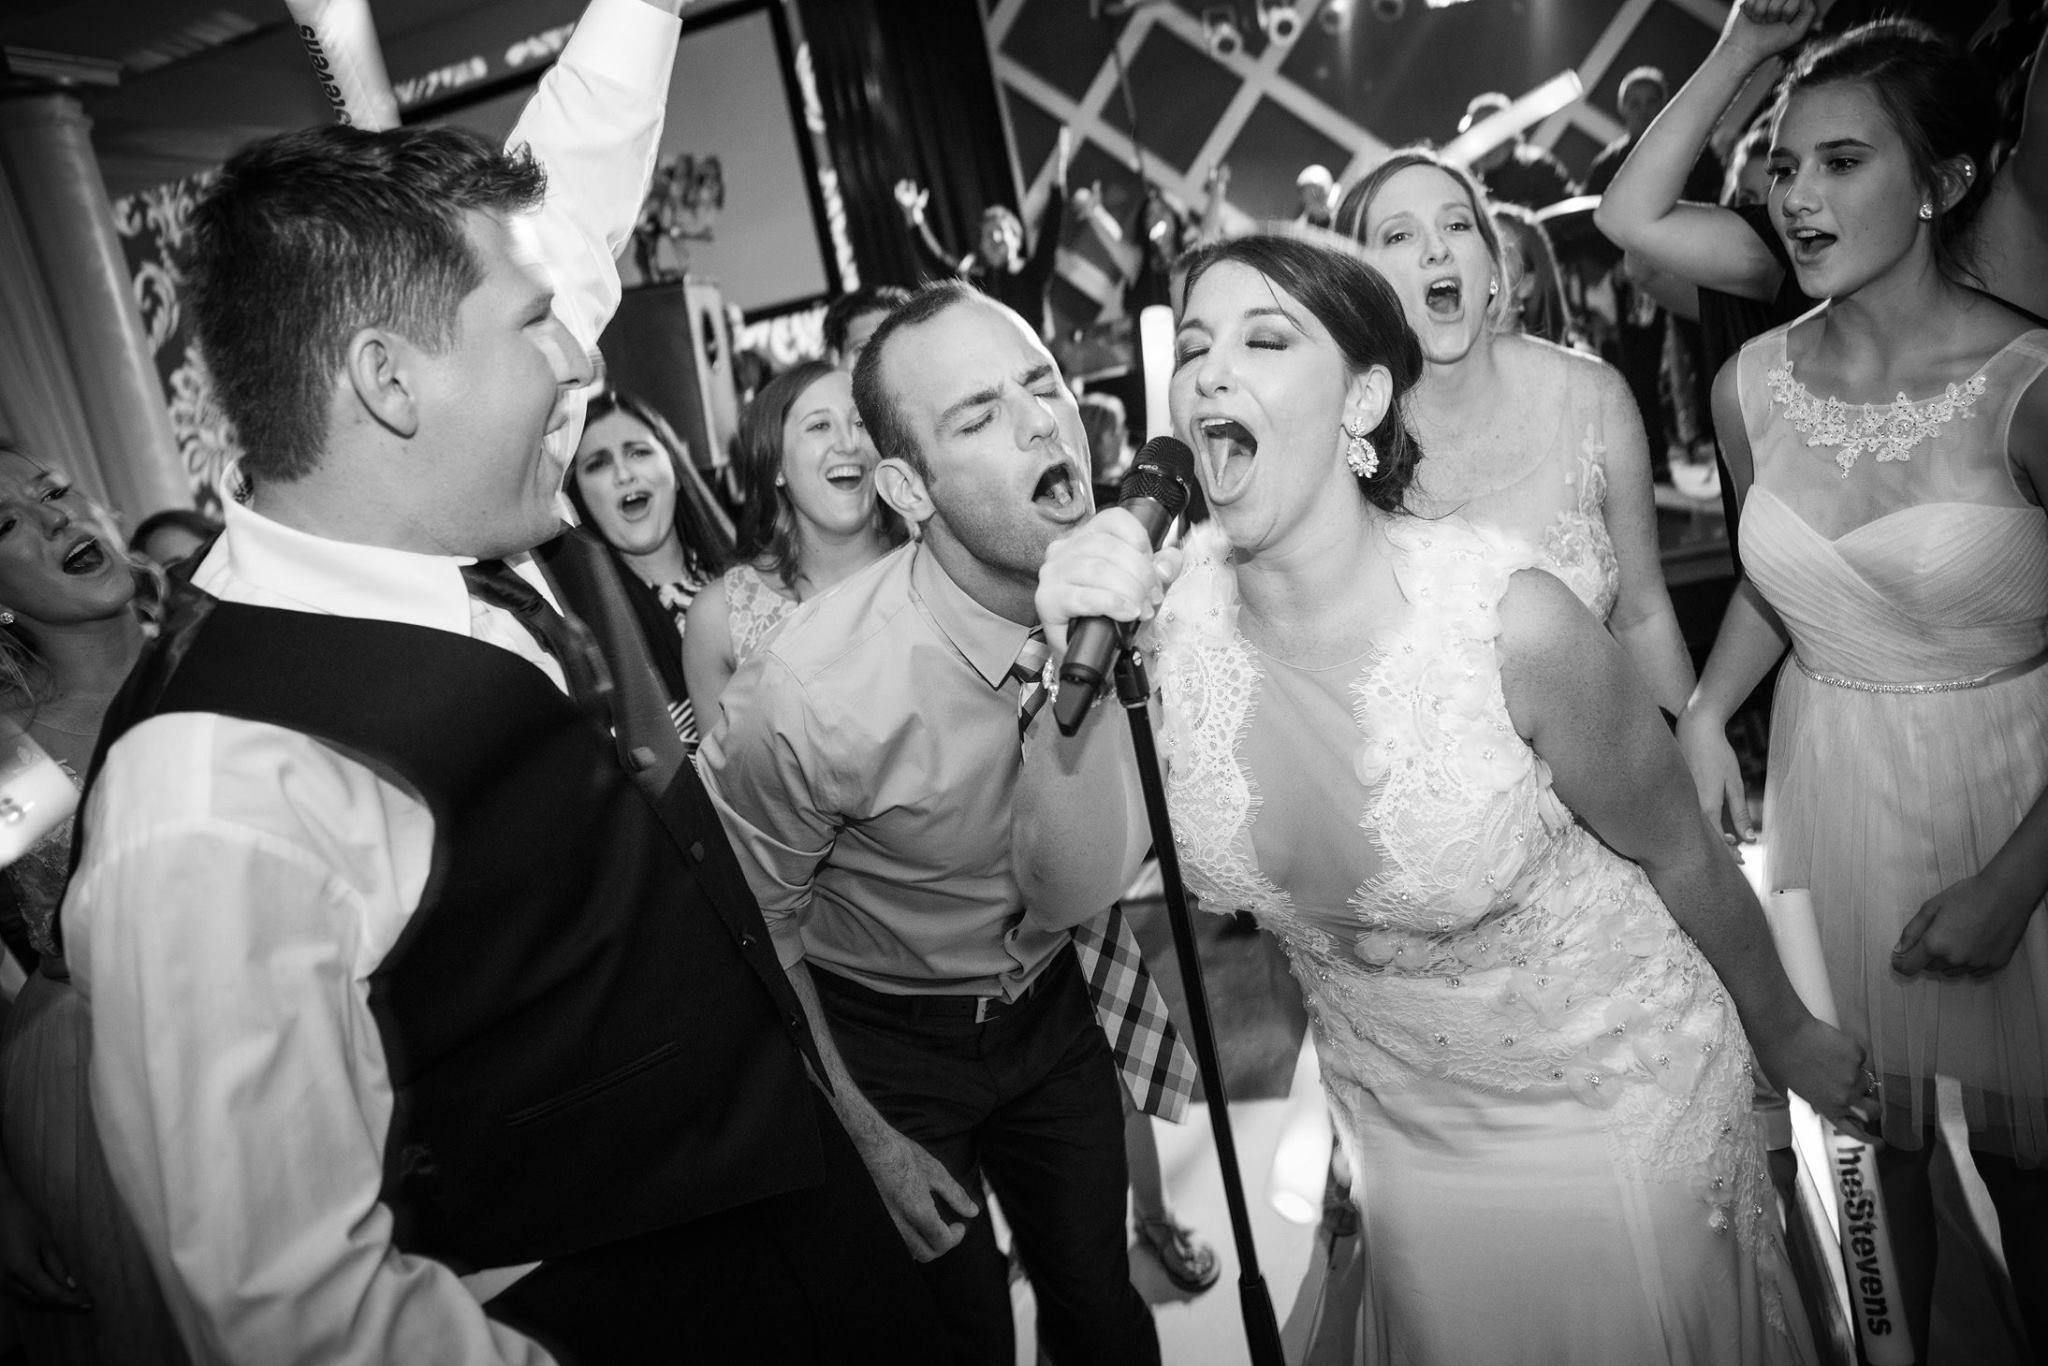 marissa wedding 1 .jpg